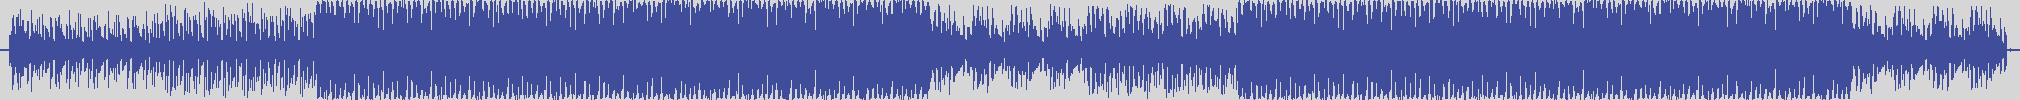 workin [WRK004] Loud Sin - Ball Earth [Cubist Mix] audio wave form